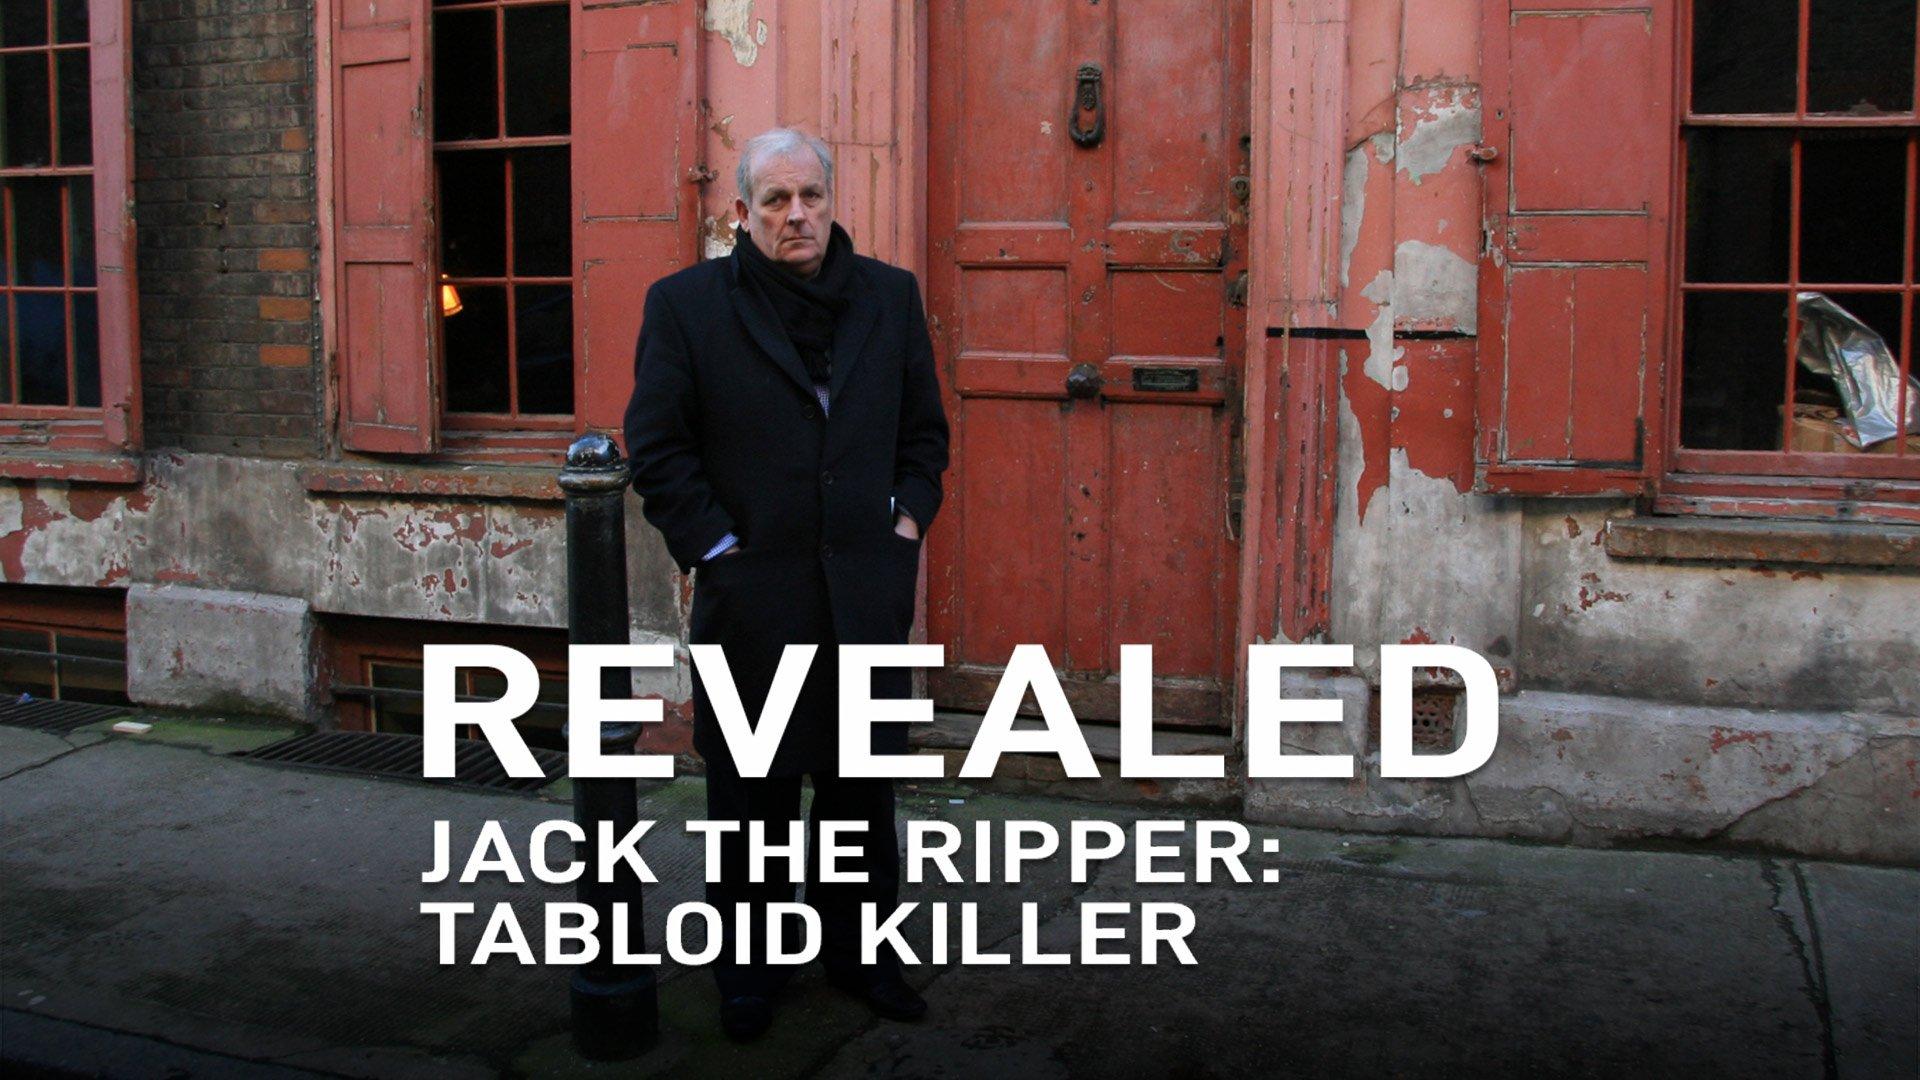 Revealed Jack the Ripper: Tabloid Killer on BritBox UK